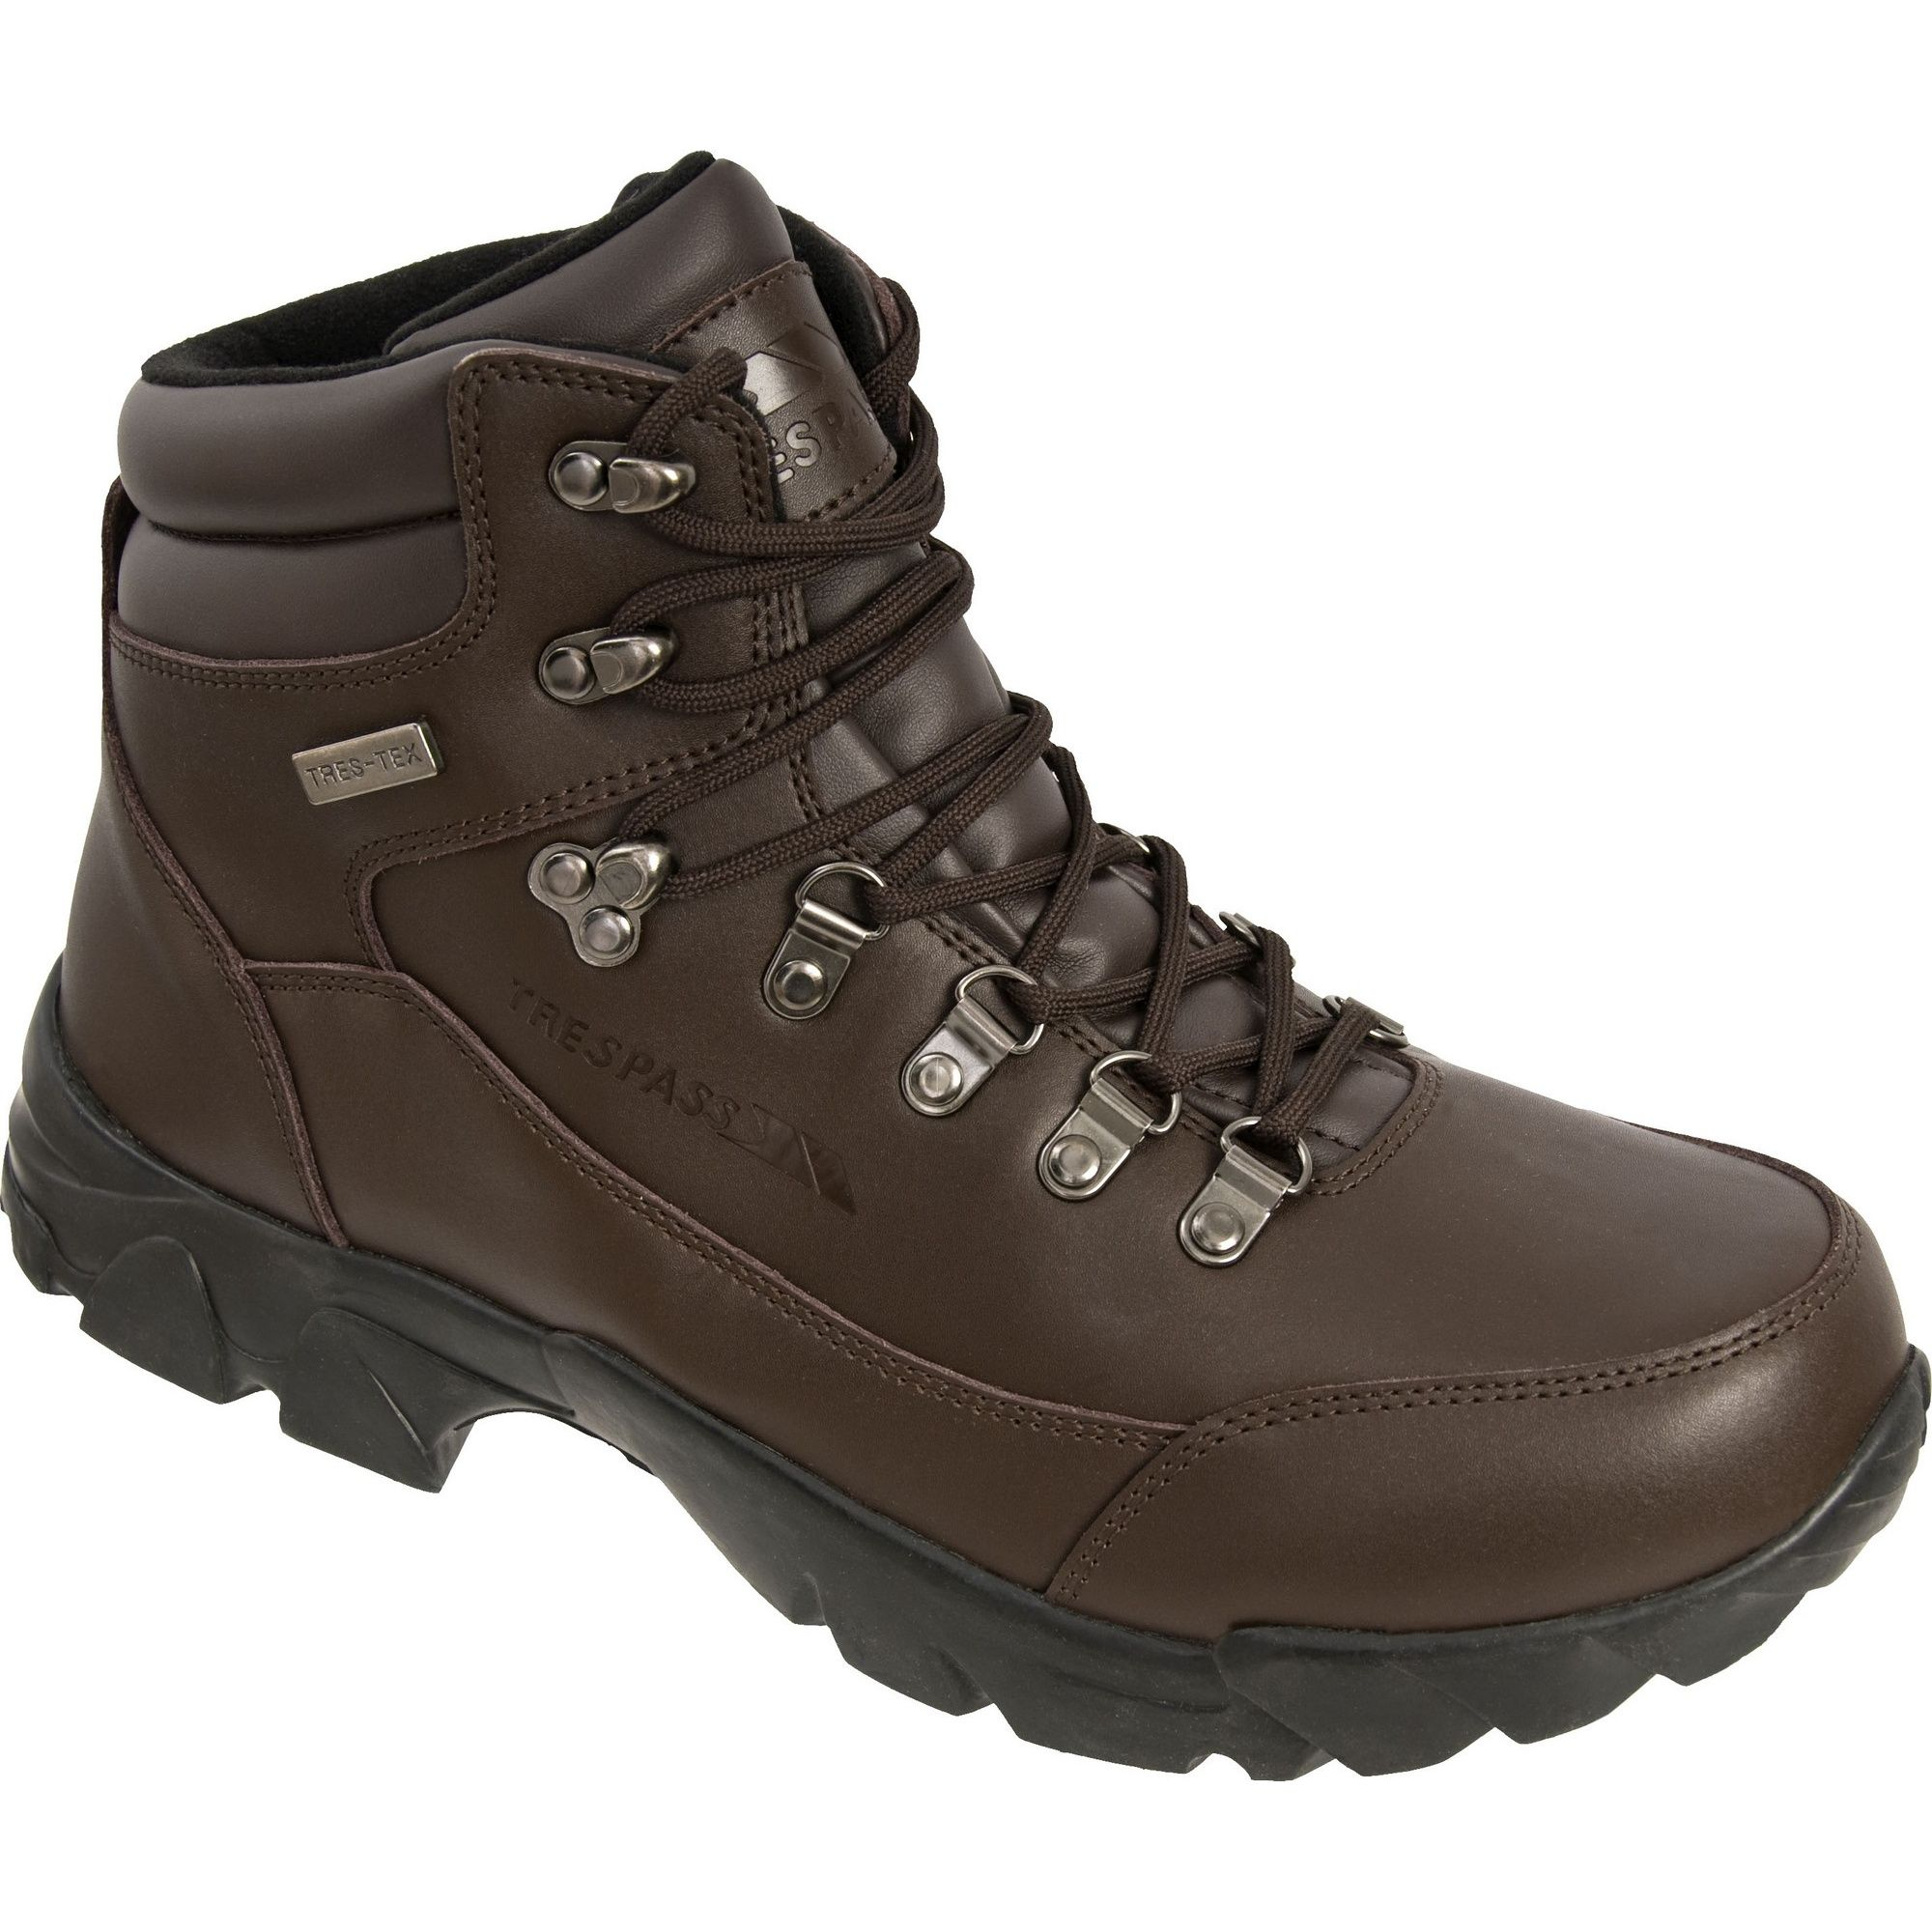 Trespass Mens Bergenz Waterproof Walking Boots (Brown)